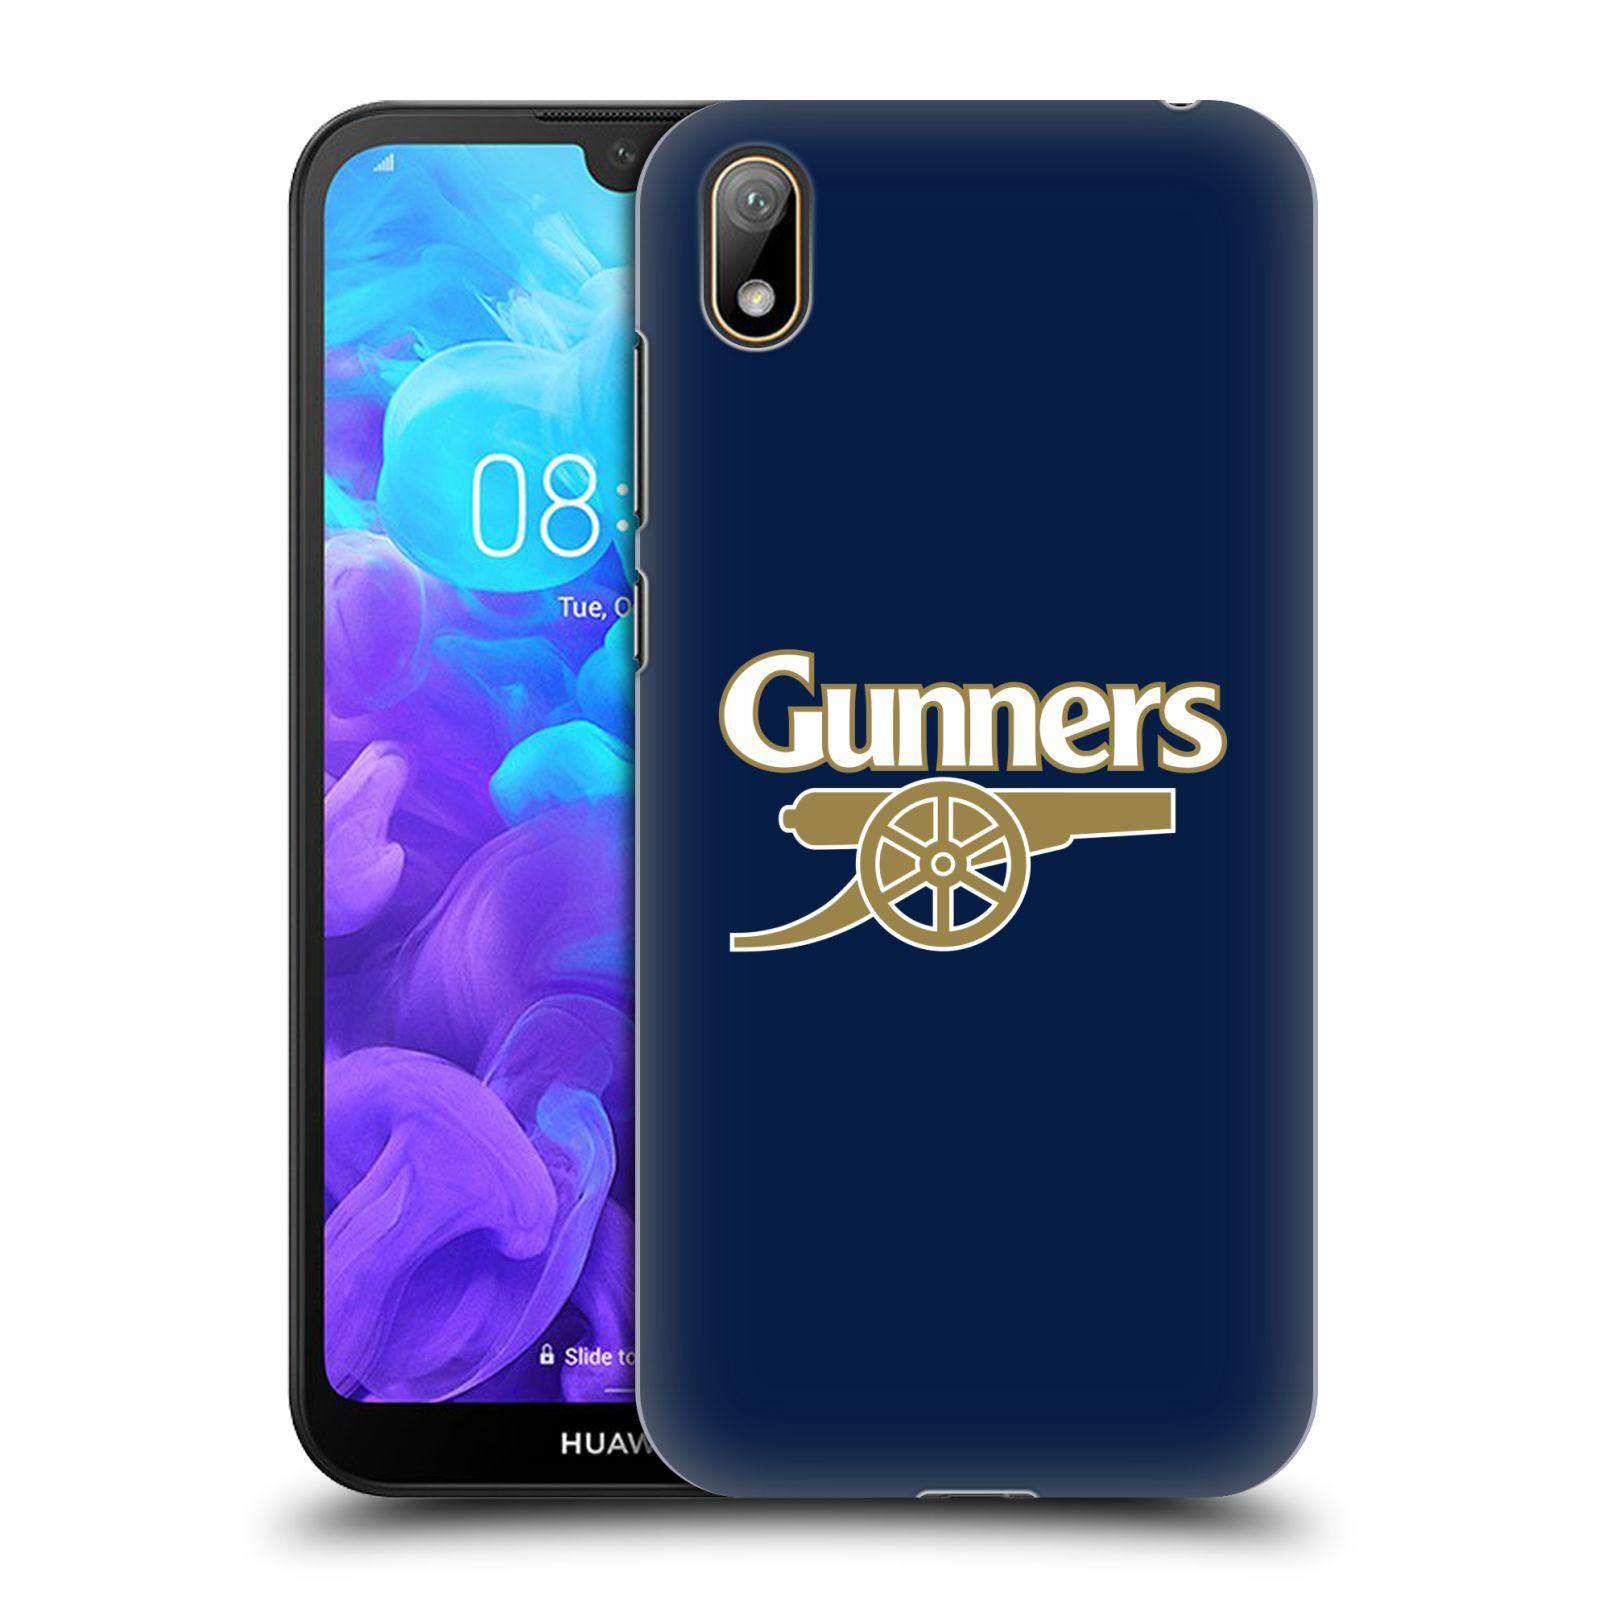 Plastové pouzdro na mobil Honor 8S - Head Case - Arsenal FC - Gunners